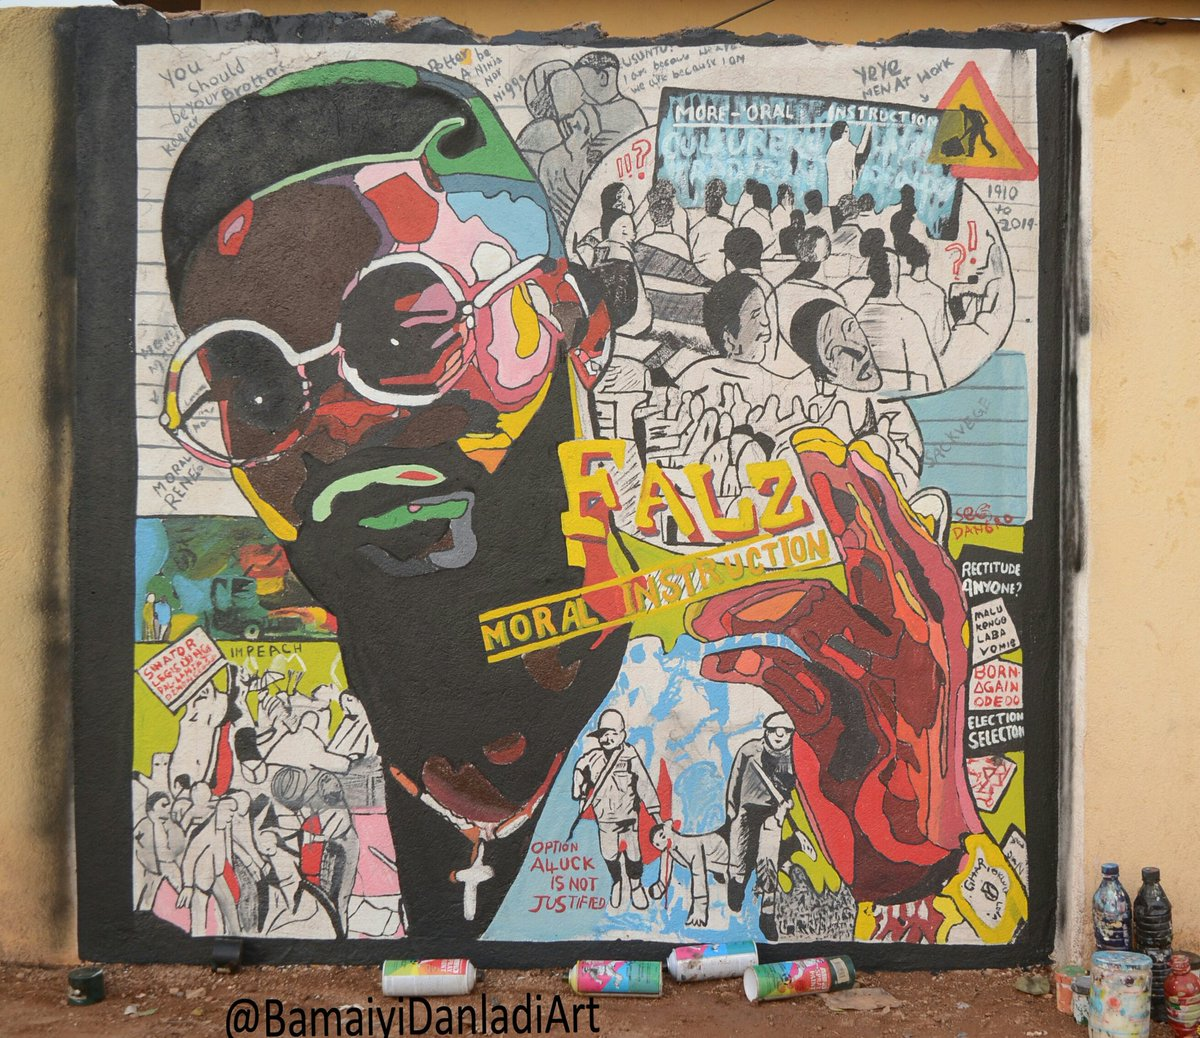 Happy Birthday @falzthebahdguy Pls Help Me Retweet So He Can See This Street Art... Bop Daddy King Falz #Graffiti #Mural #BlackTuesdayNigeria #veeiye #laycon1monthwinverssary #Desmond